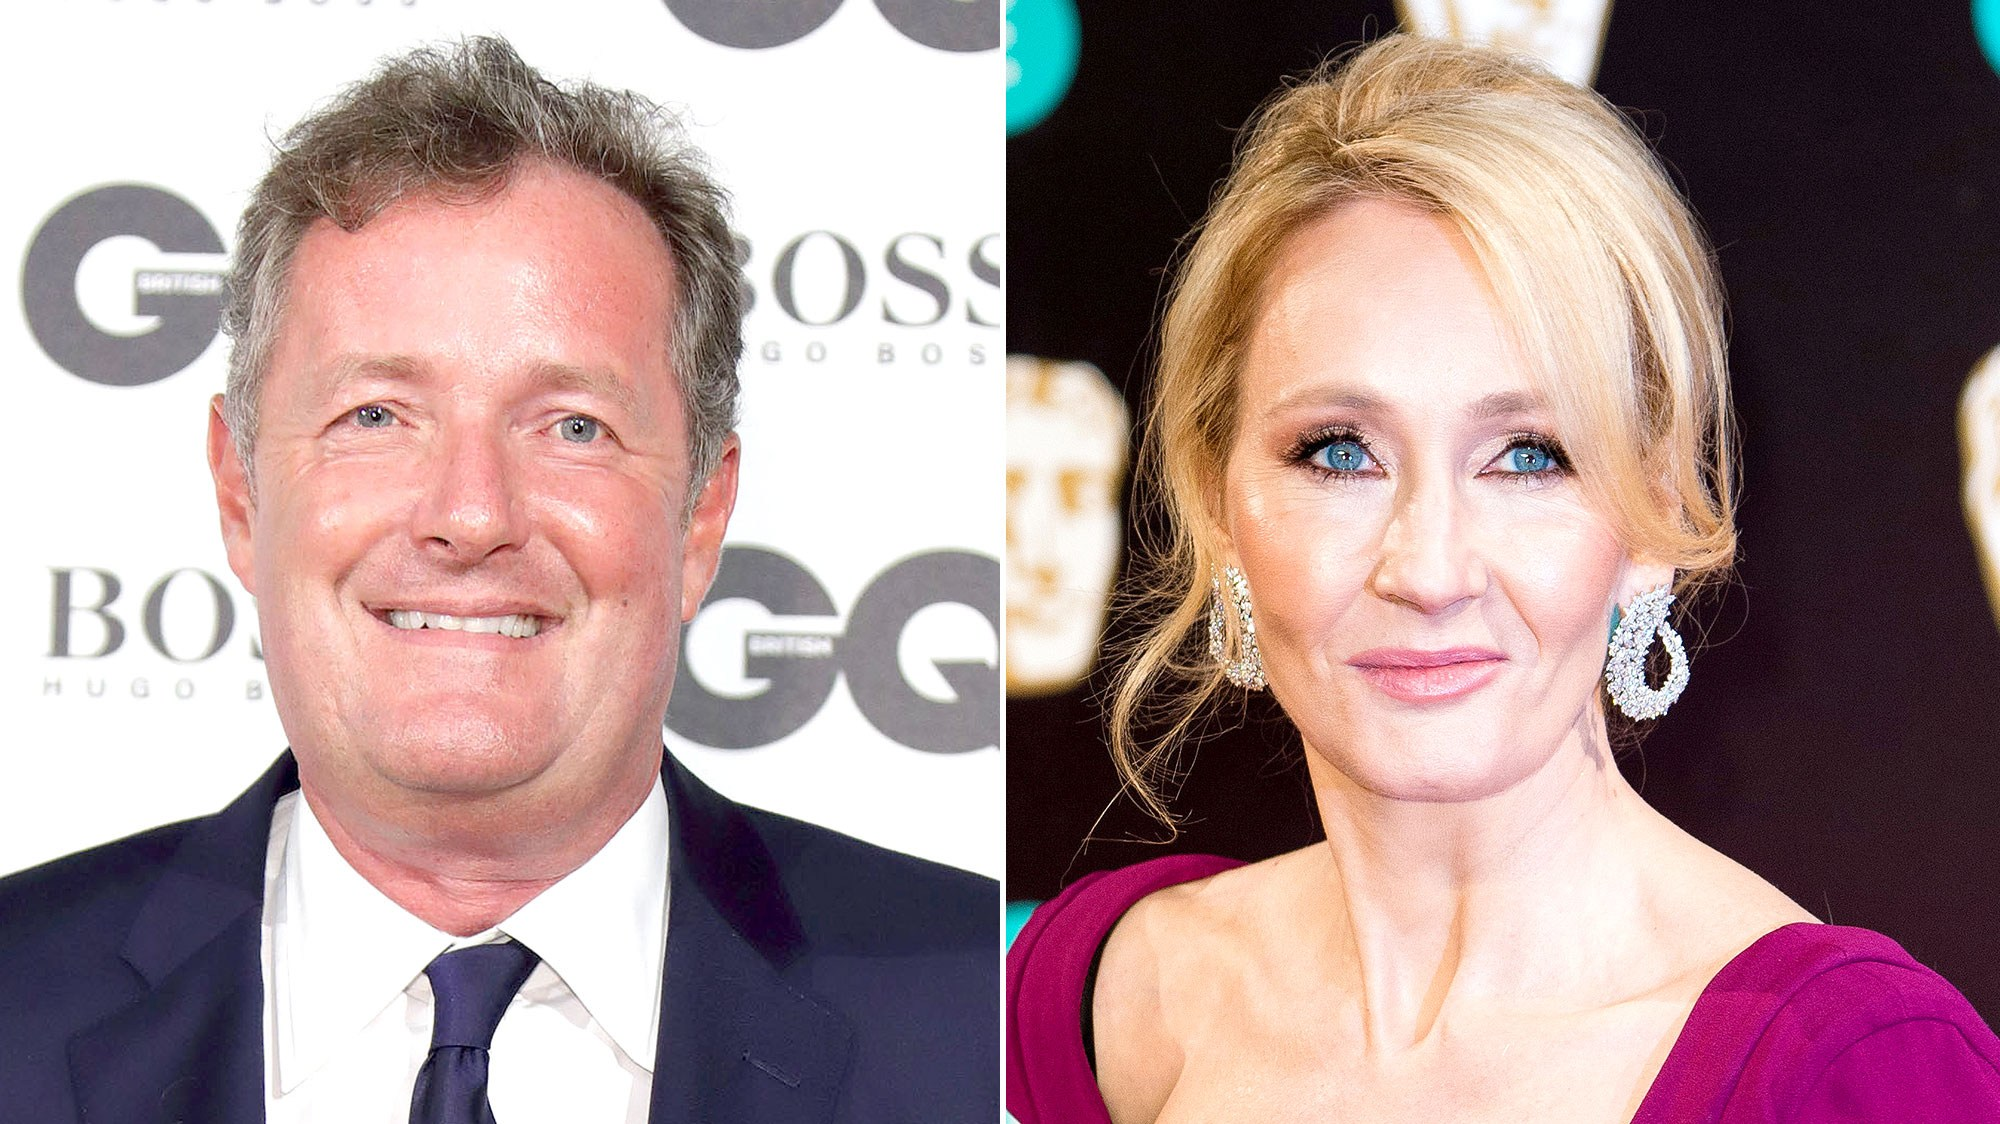 Piers Morgan, J.K. Rowling